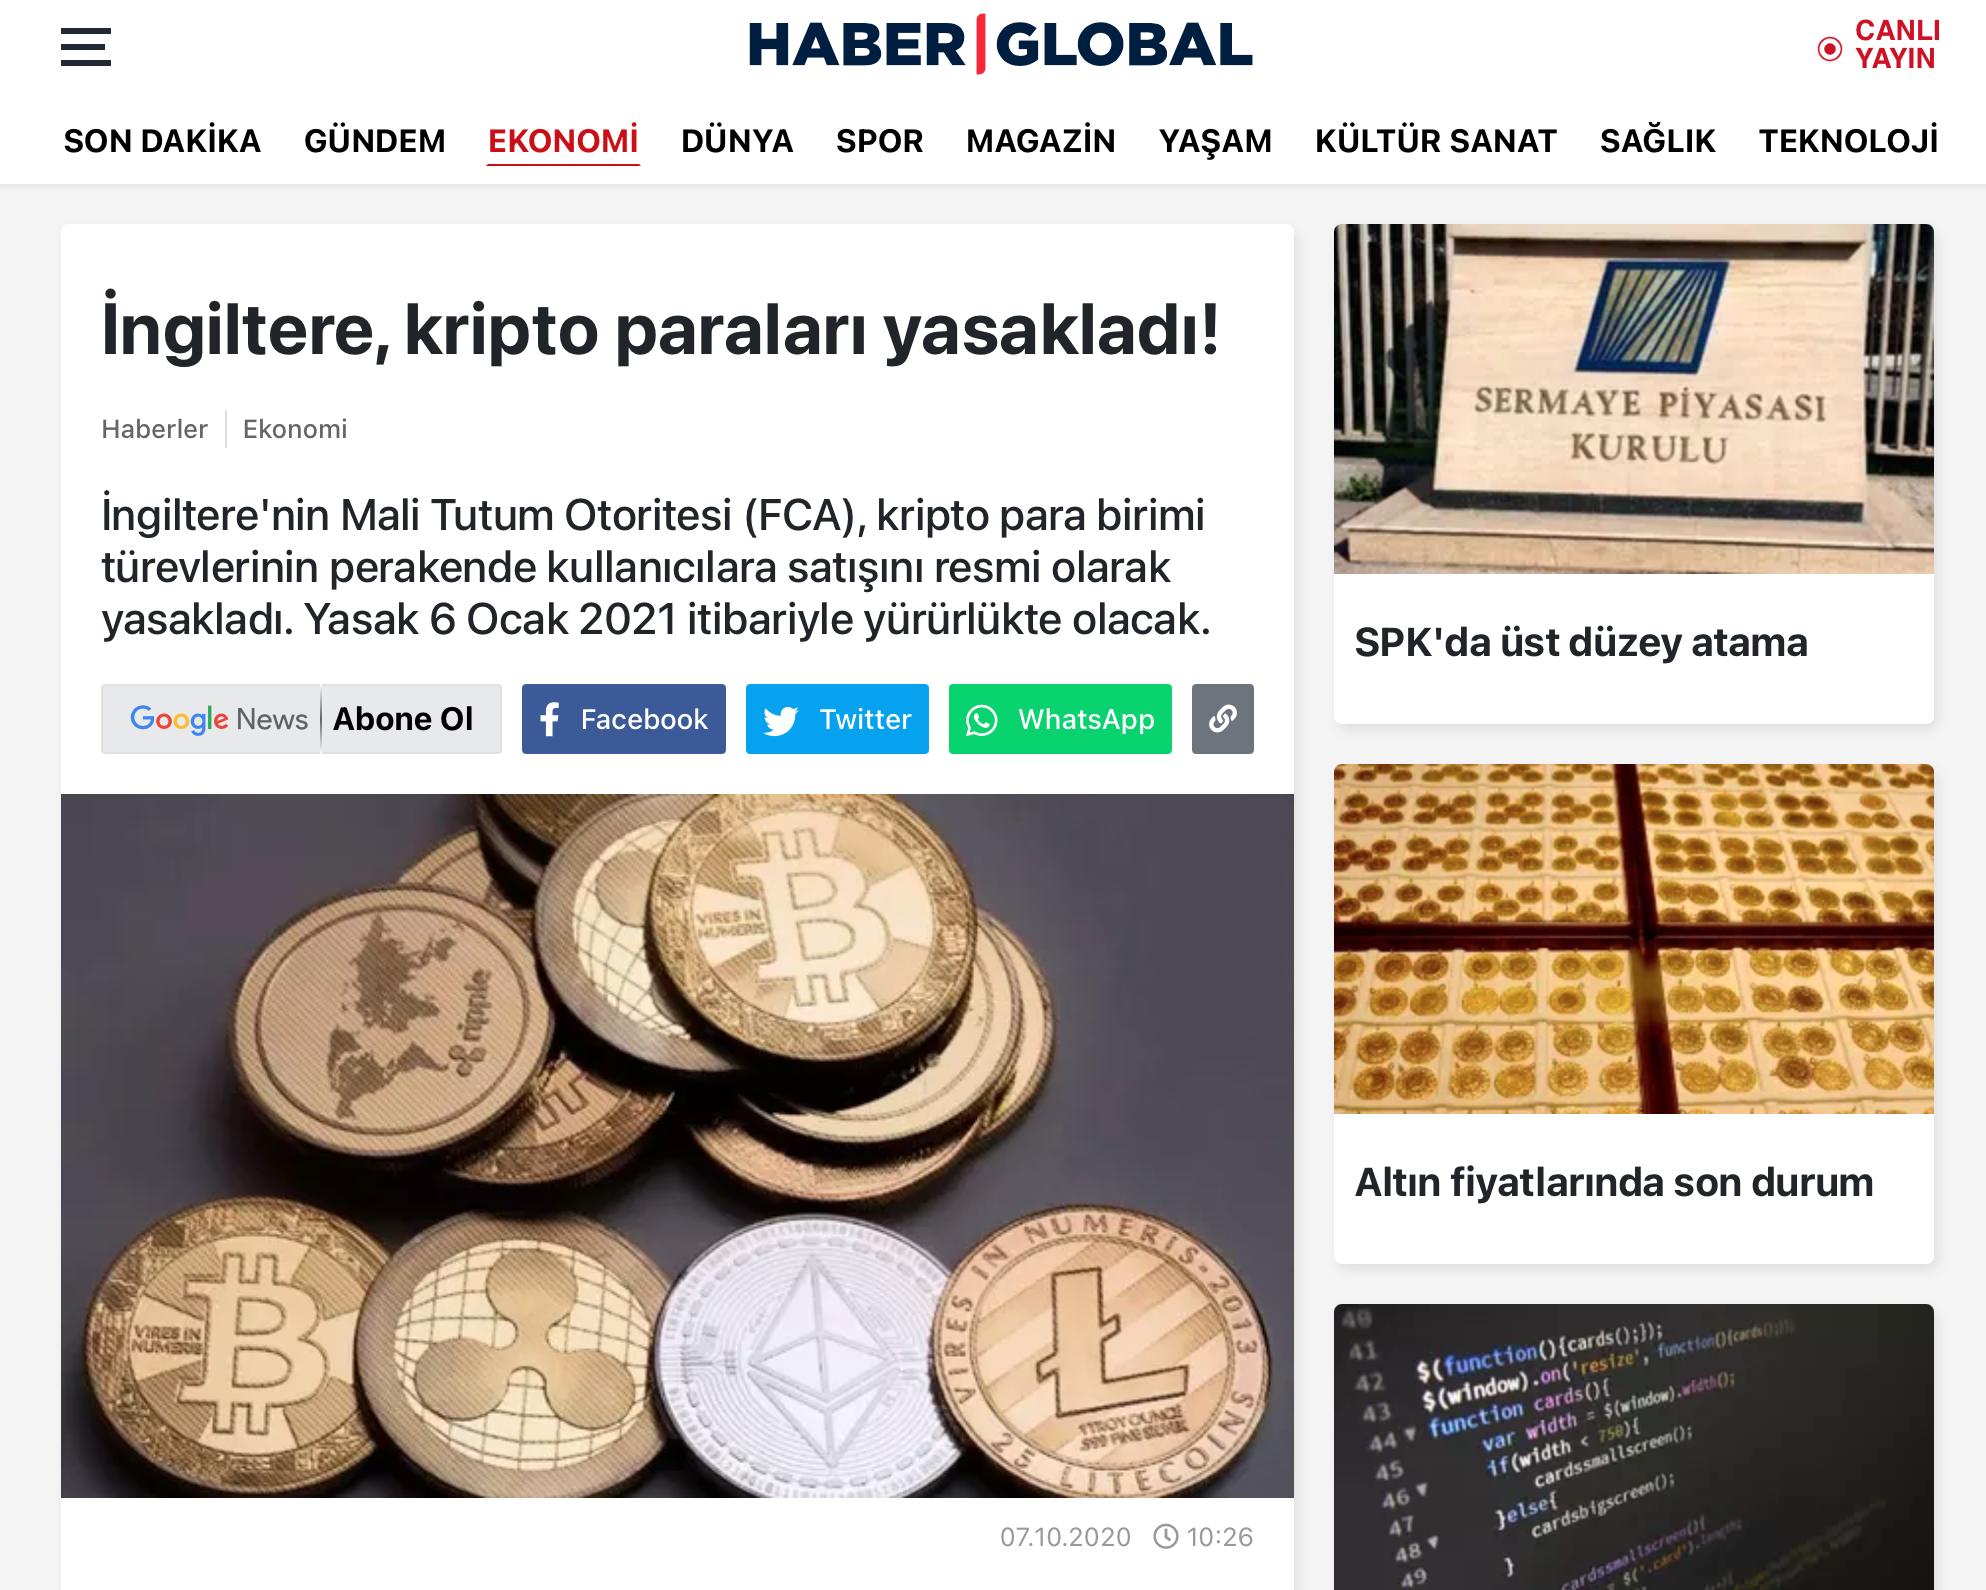 Haber Global Kripto Paralar